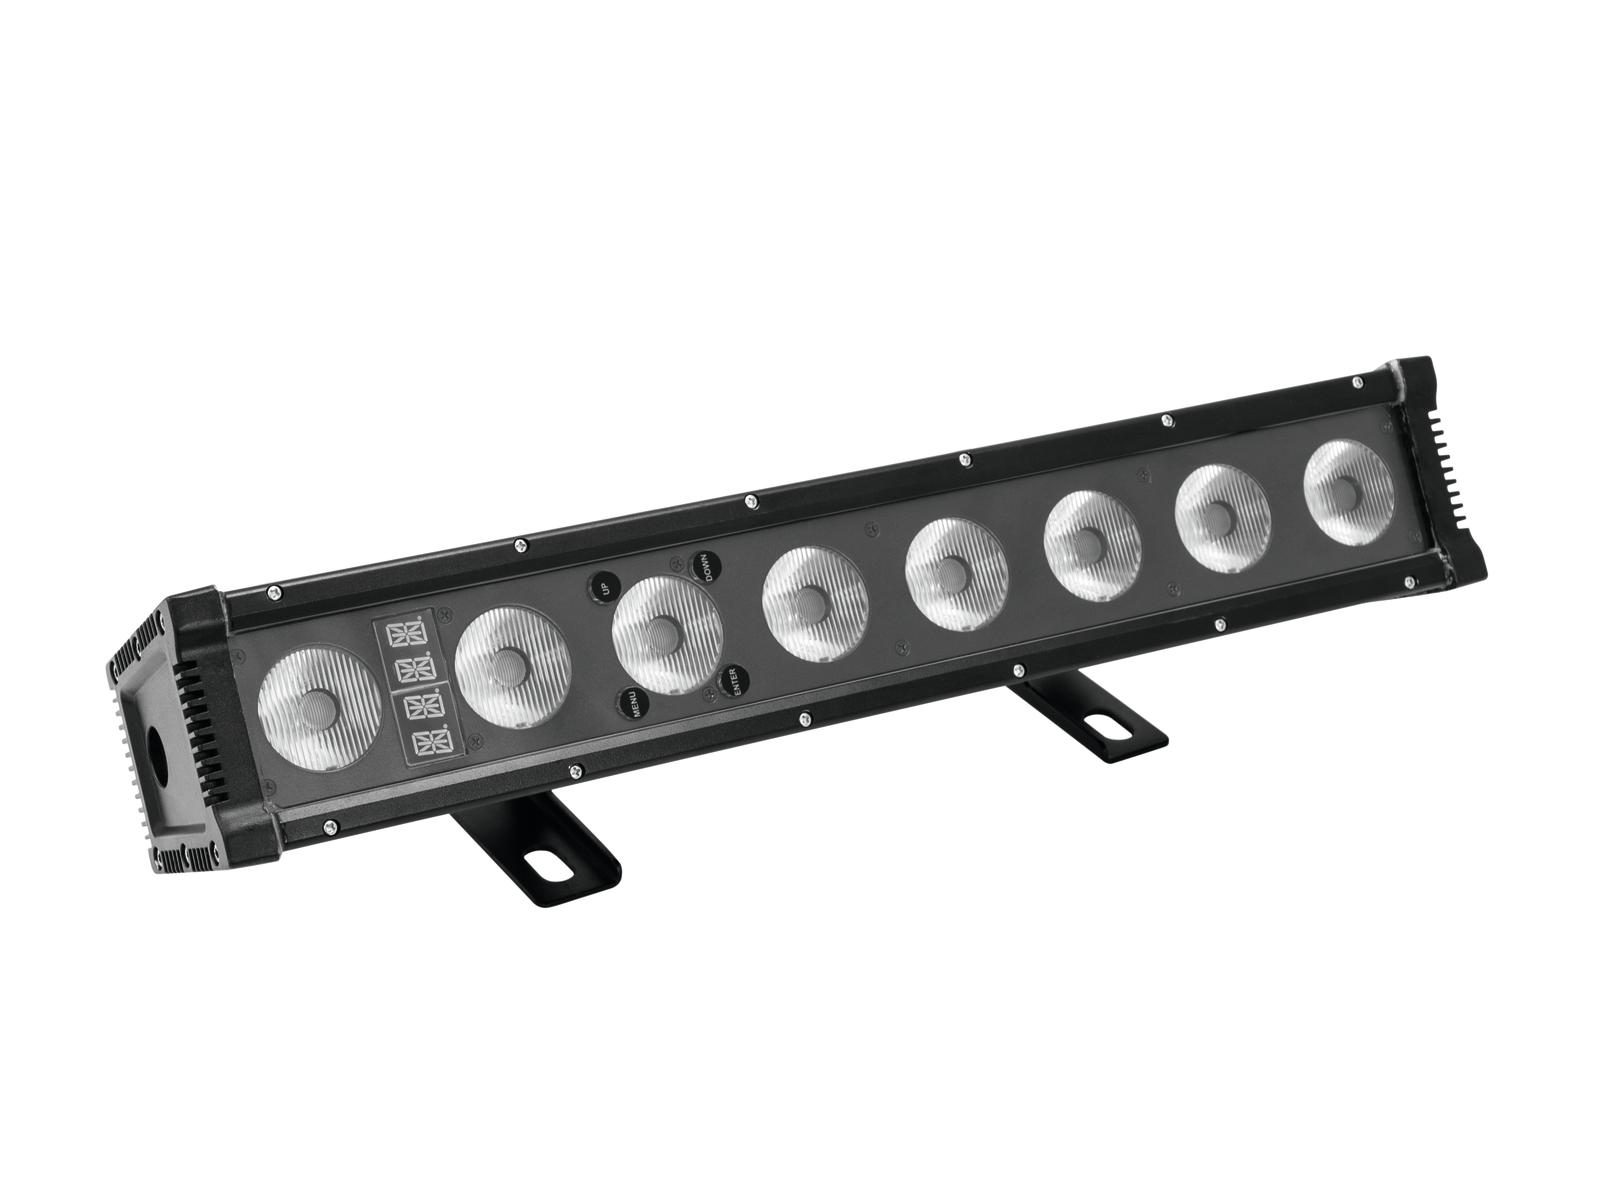 Fotografie Eurolite LED IP T1000, 8x10W QCL, IP65, DMX, světelná lišta